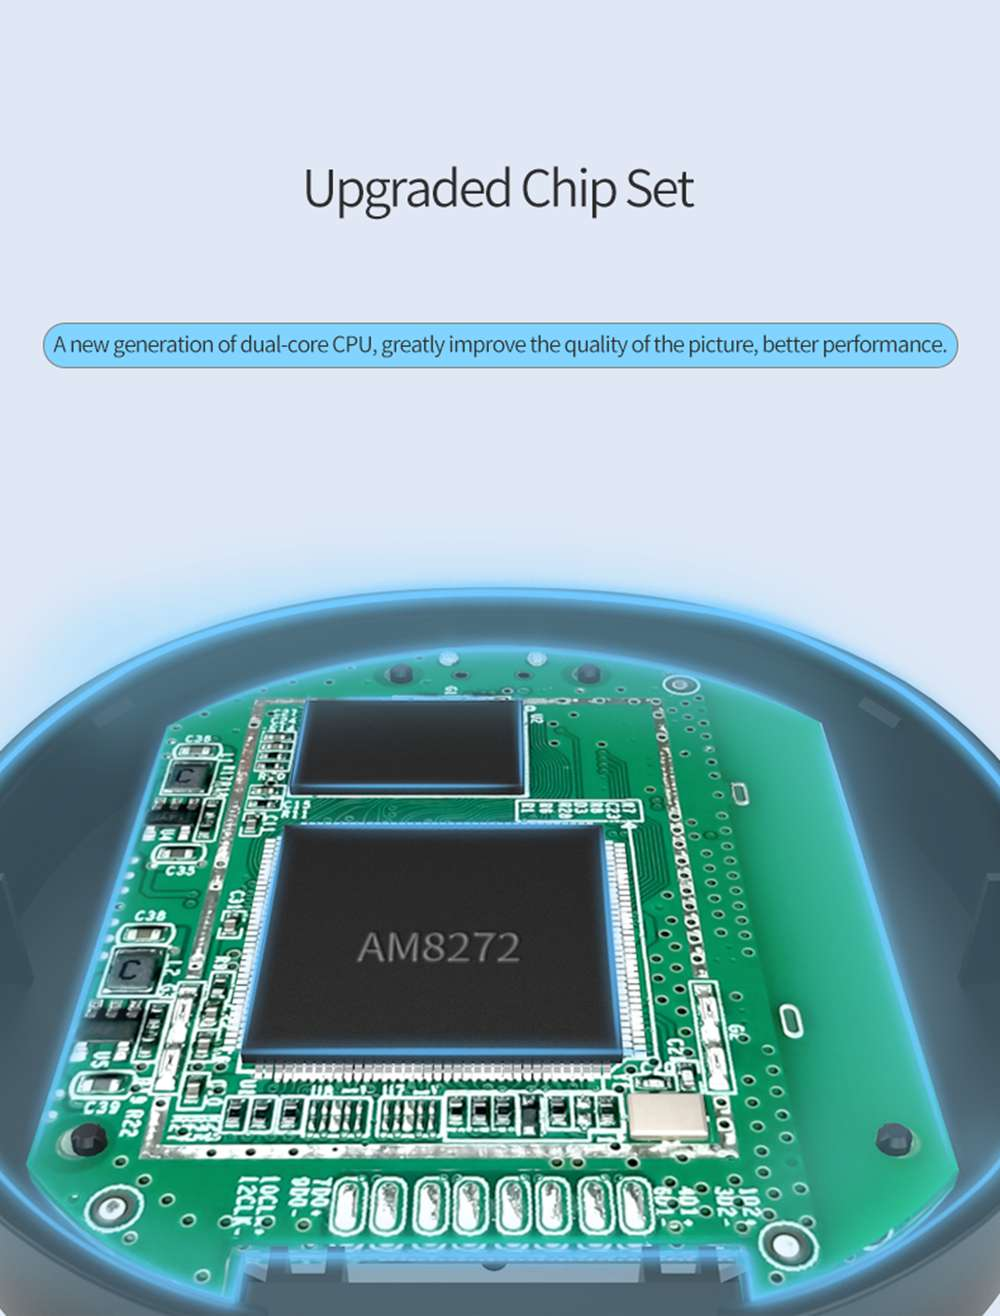 MiraScreen G10A Wireless Display Receiver Plug Play 2.4G 5G WIFI (6)